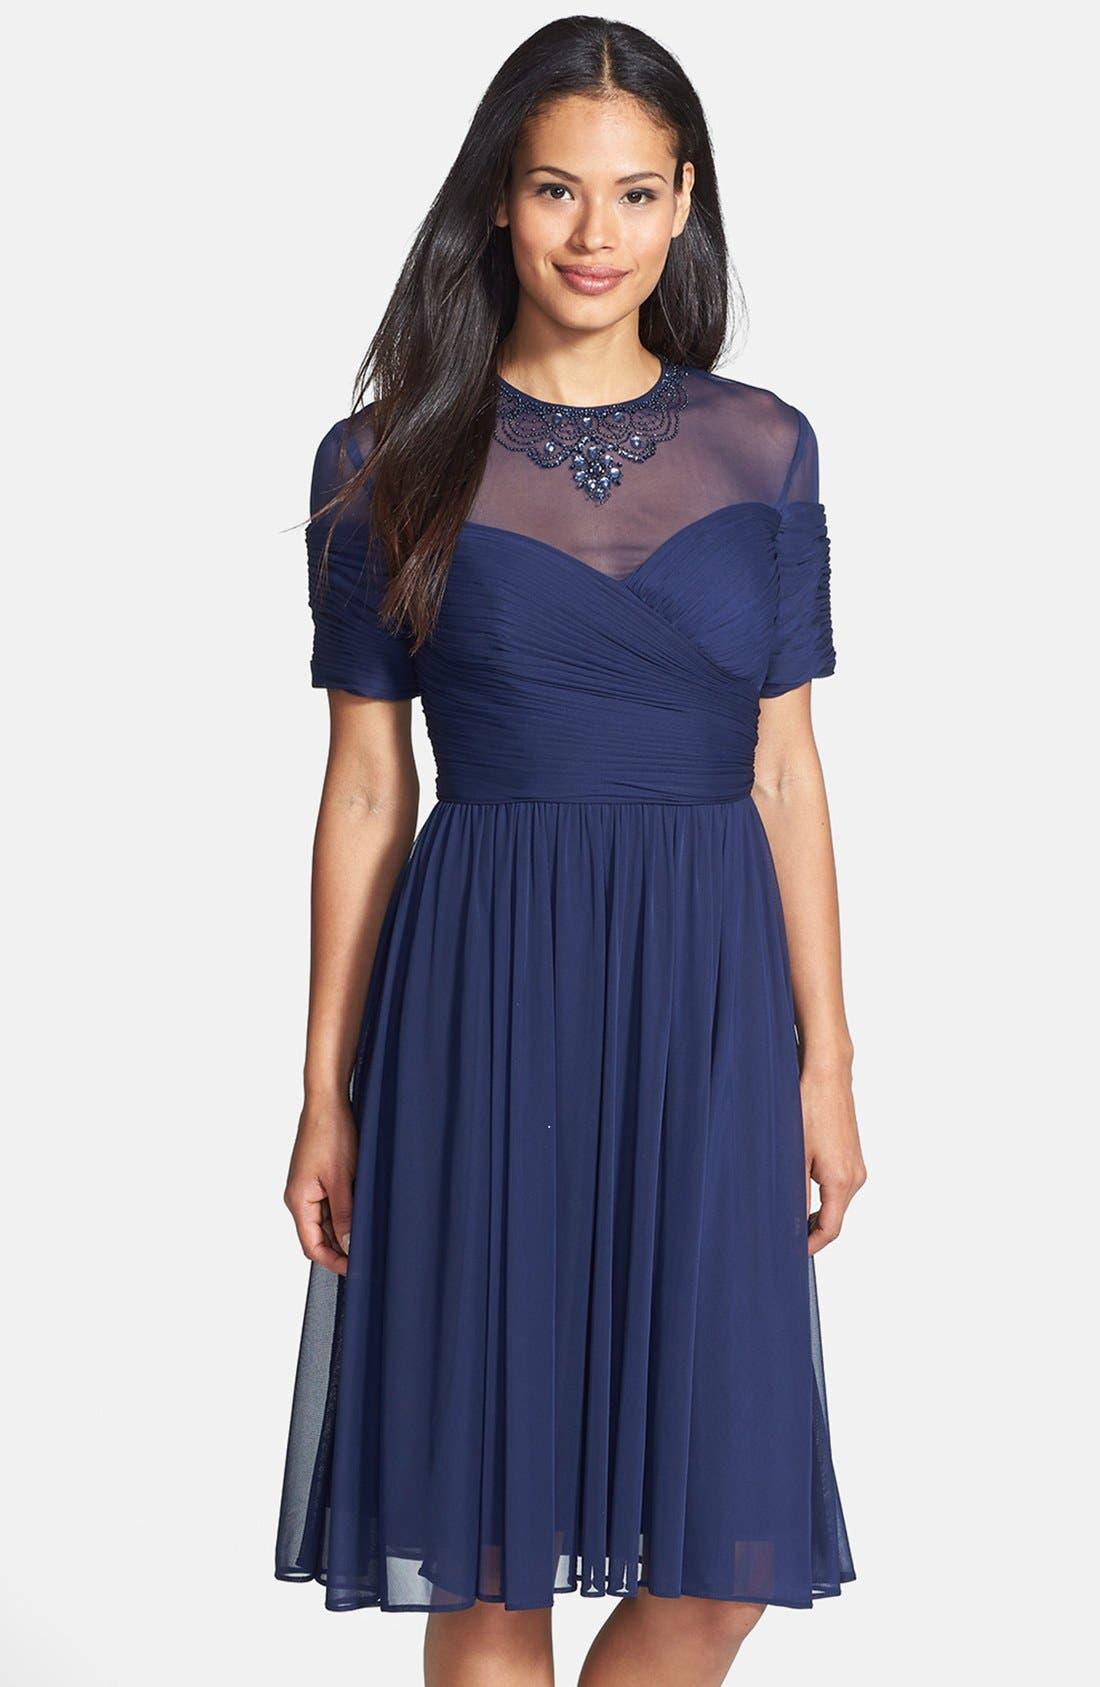 Alternate Image 1 Selected - Alex Evenings Embellished Illusion Yoke Chiffon Fit & Flare Dress (Regular & Petite)